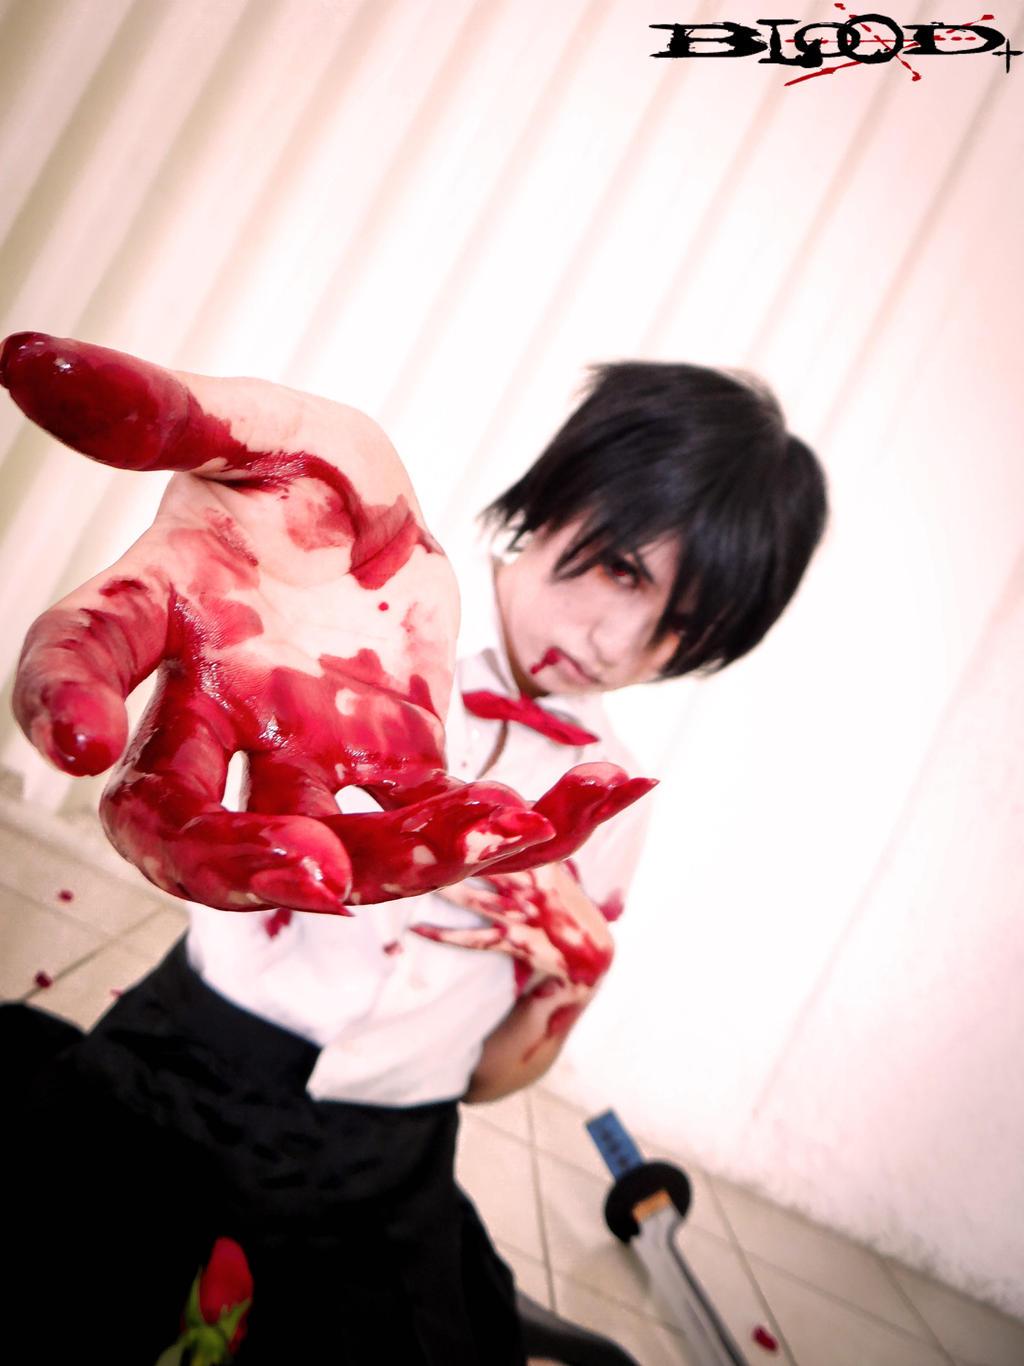 BLOOD by KasaNeko